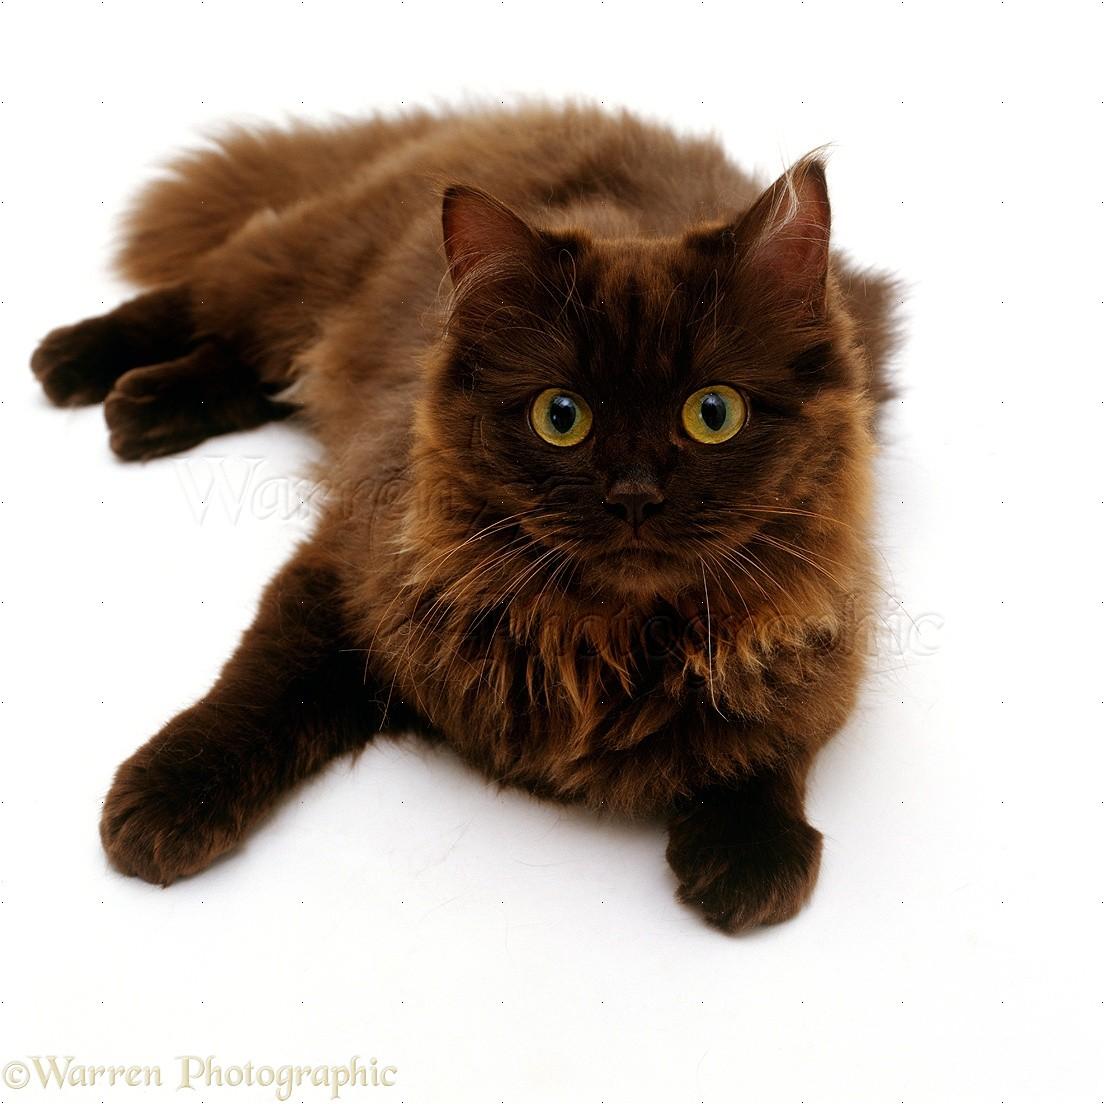 Chocolate Persian cross female cat photo - WP16616